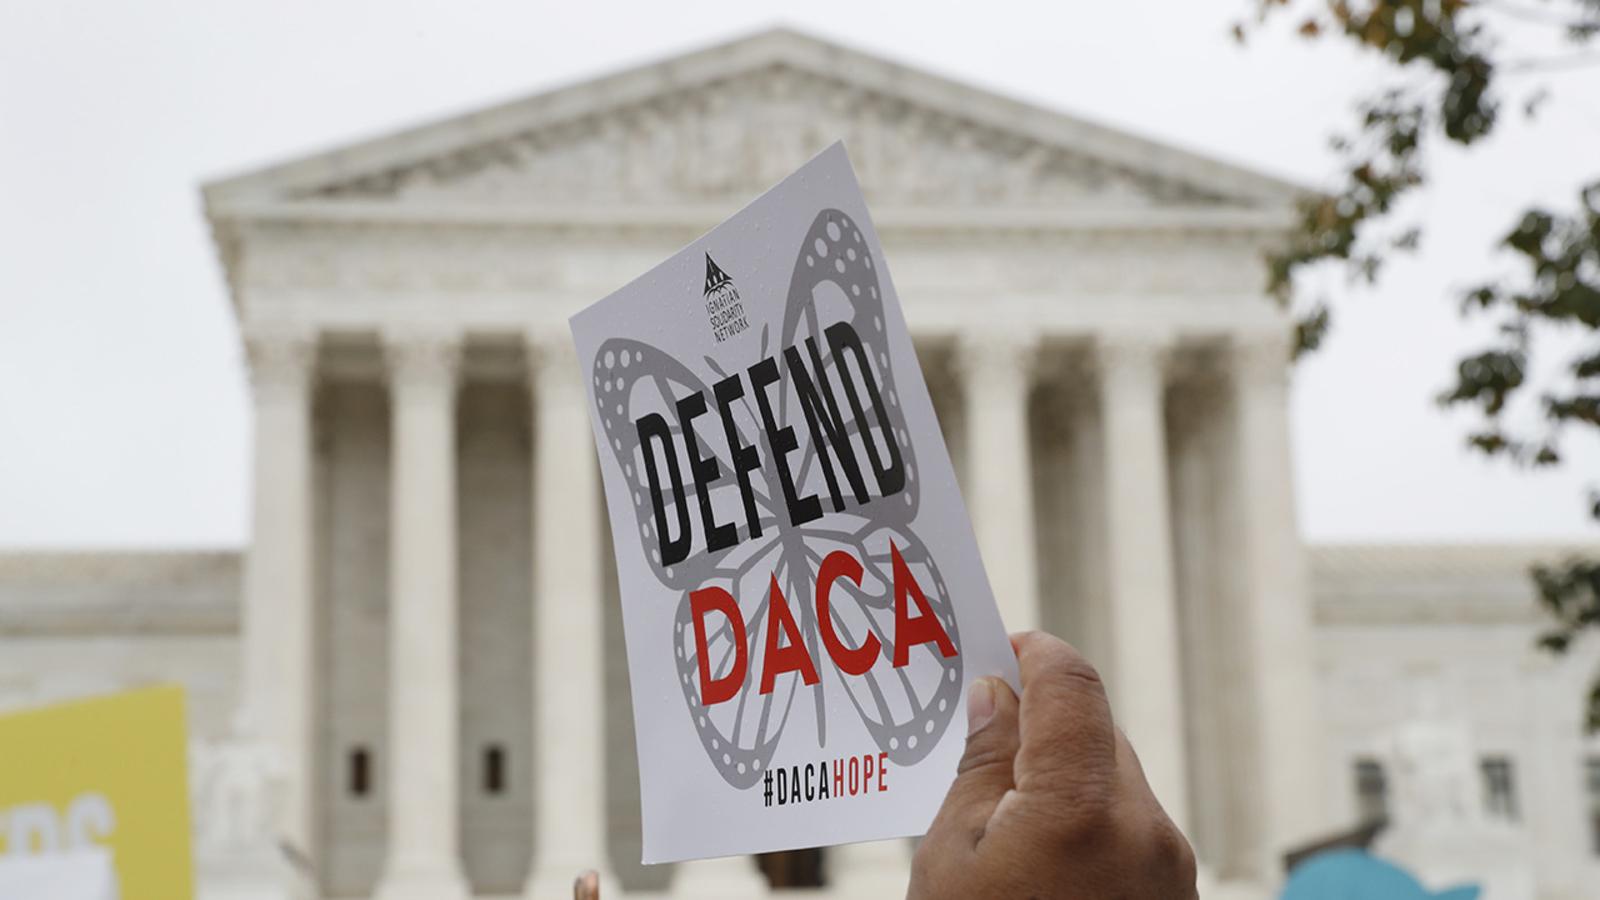 Santa Clara Co. leaders address Supreme Court's rejection of Trump's bid to end DACA